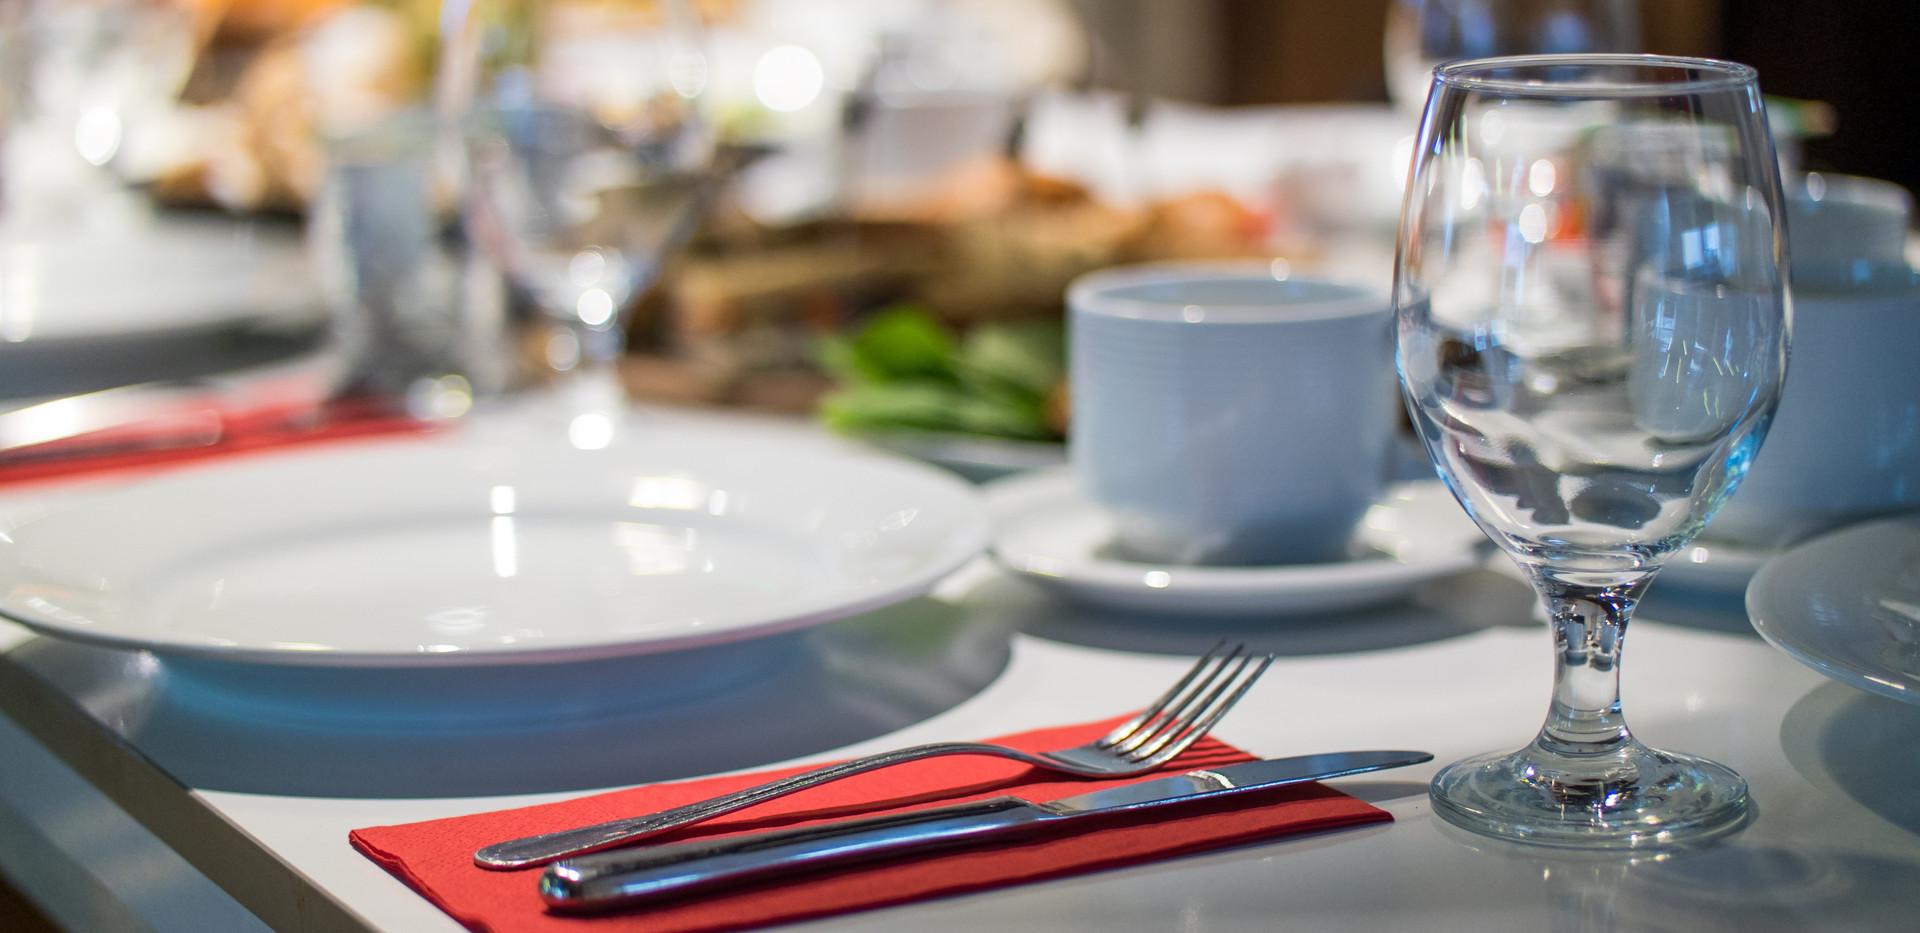 blur-close-up-cutlery-735869.jpg